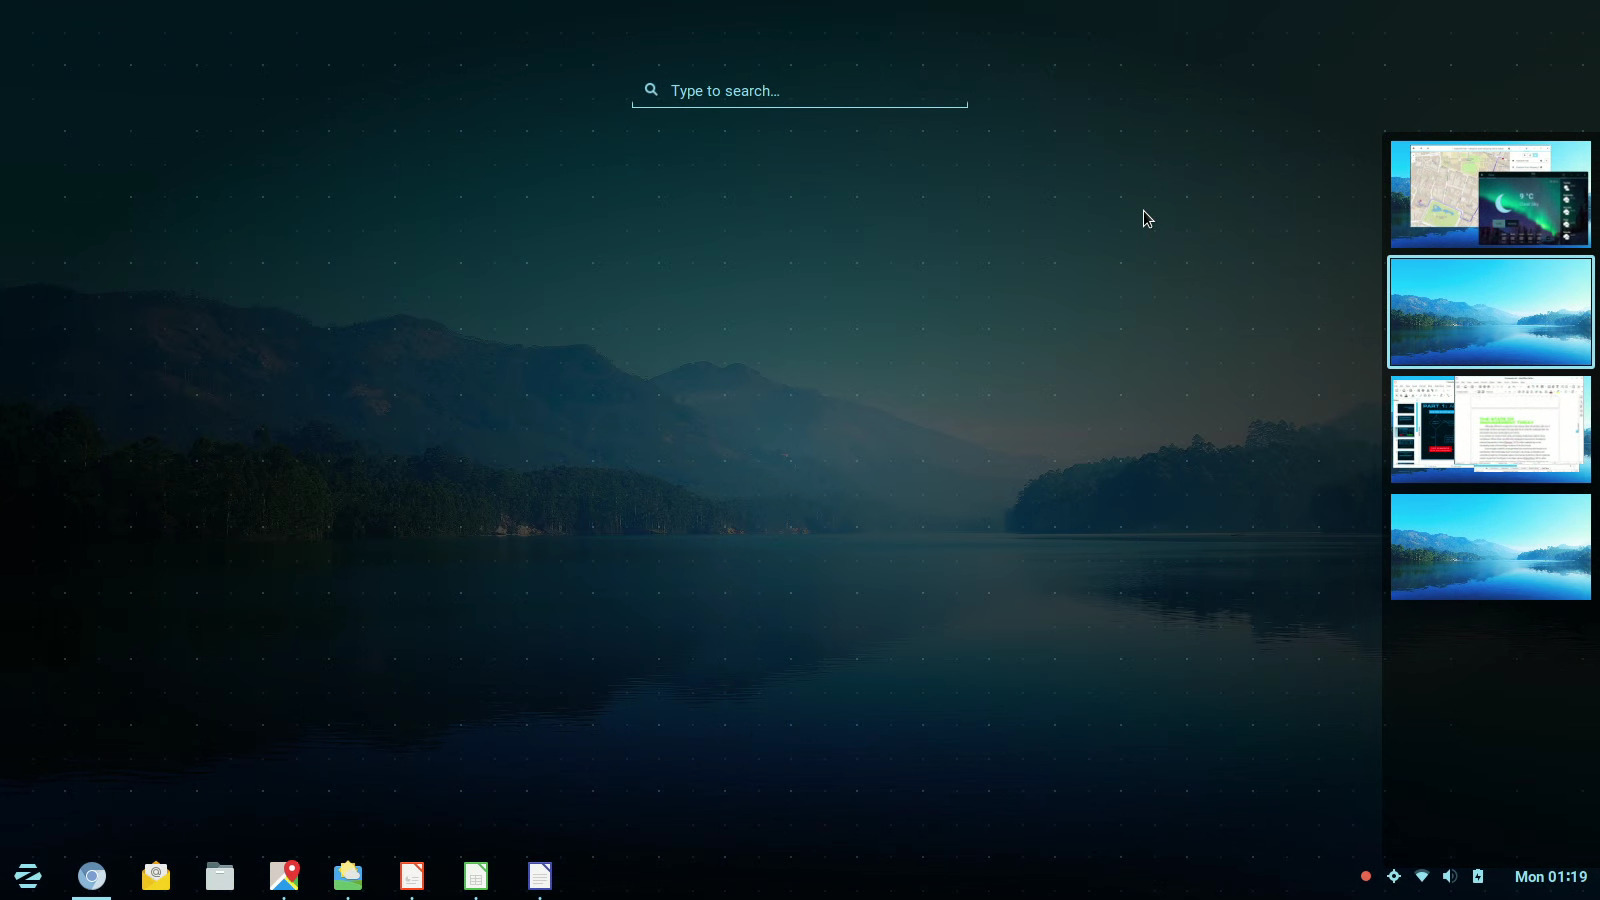 Zorin OS 12 Beta 发布,专为 Linux 新手设计-芊雅企服